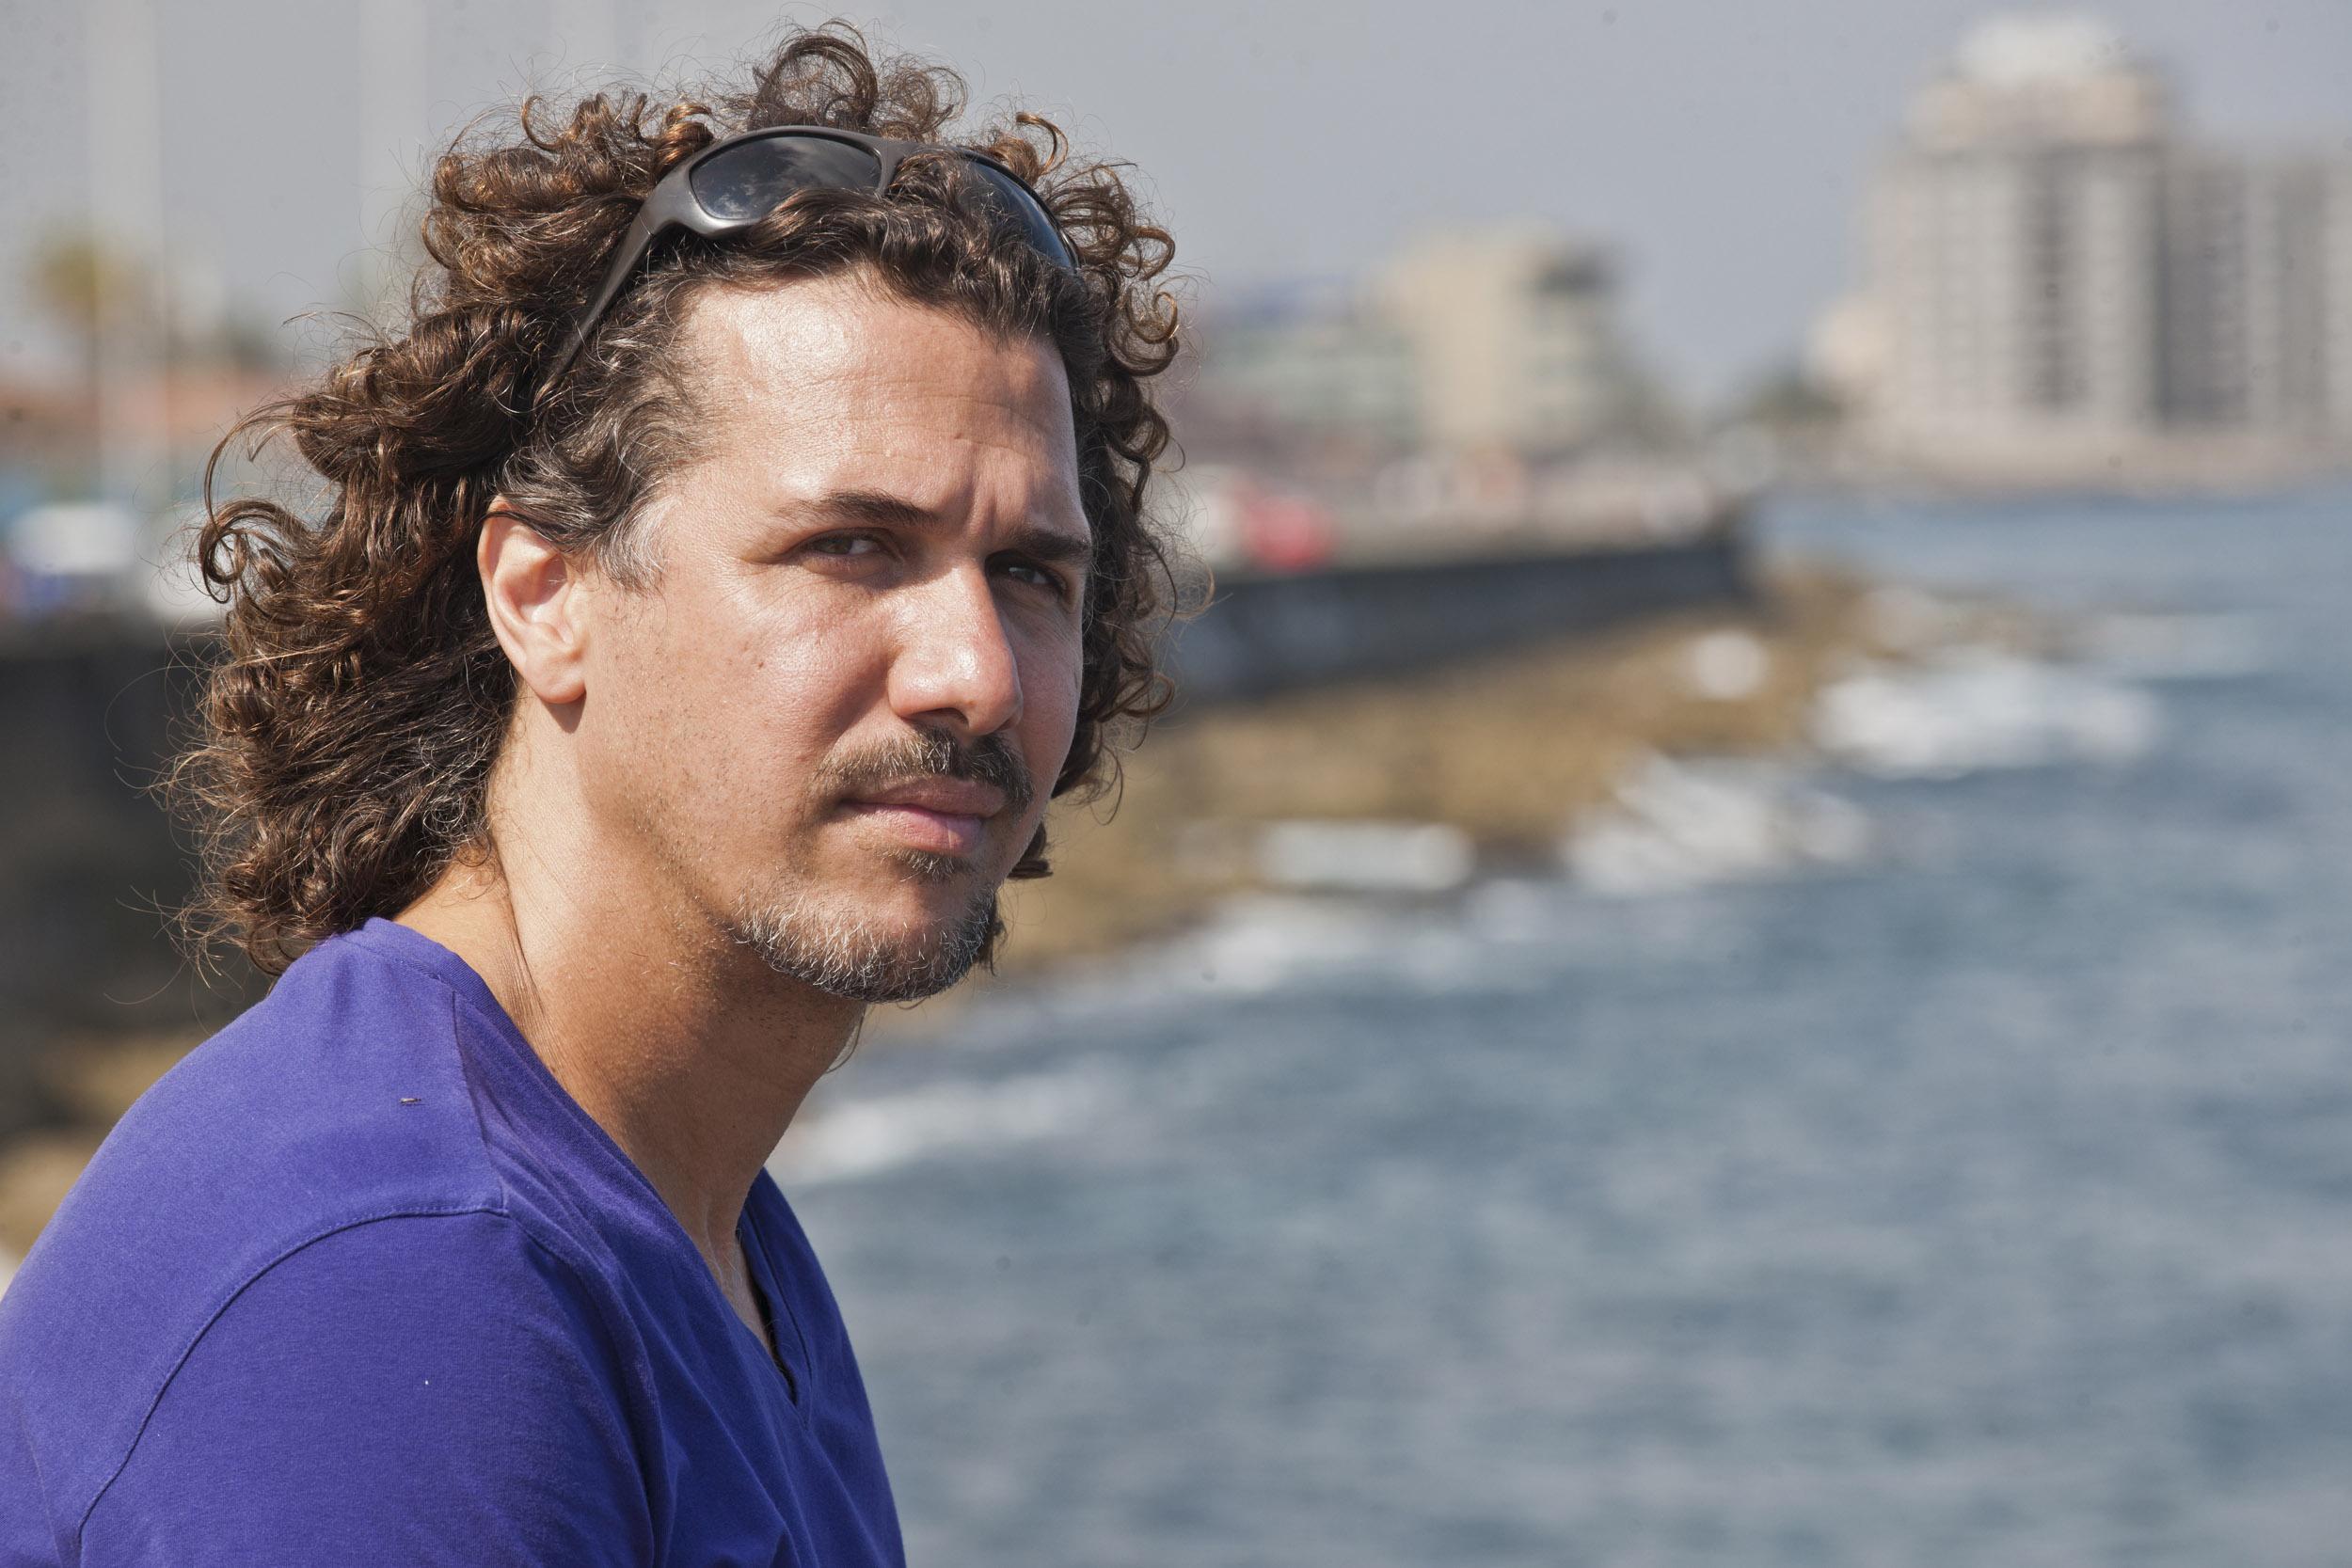 Roberto Carcassés, musician - Illuminated Cuba - Hector Garrido, Aerial and human photography